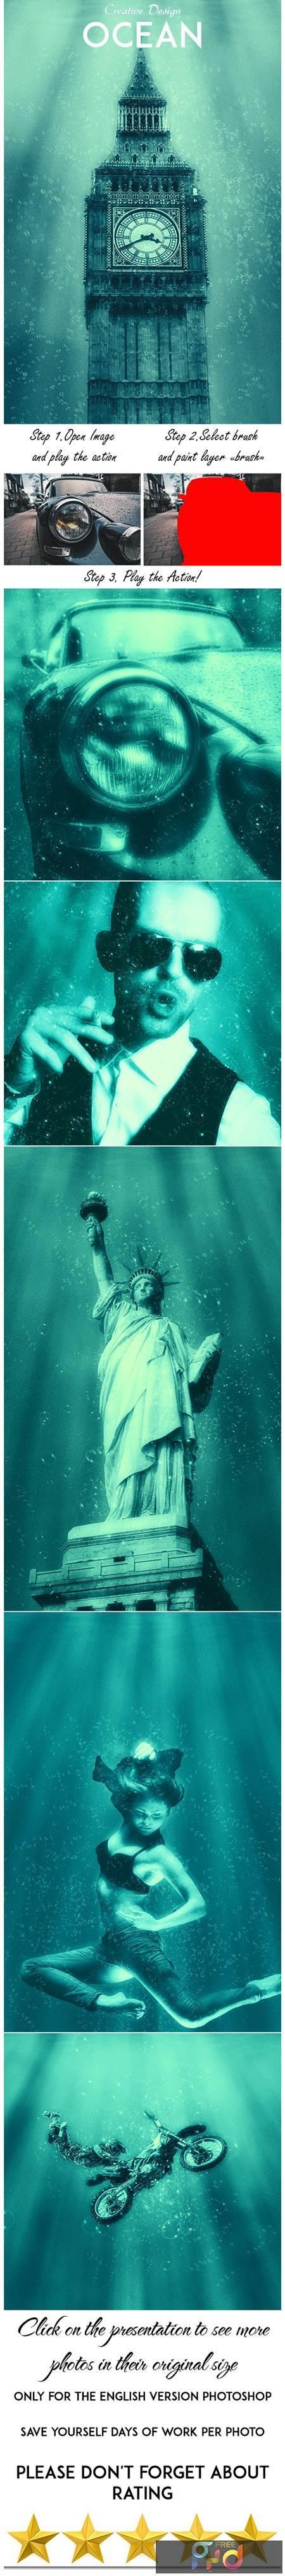 Ocean Photoshop Action 27925111 1